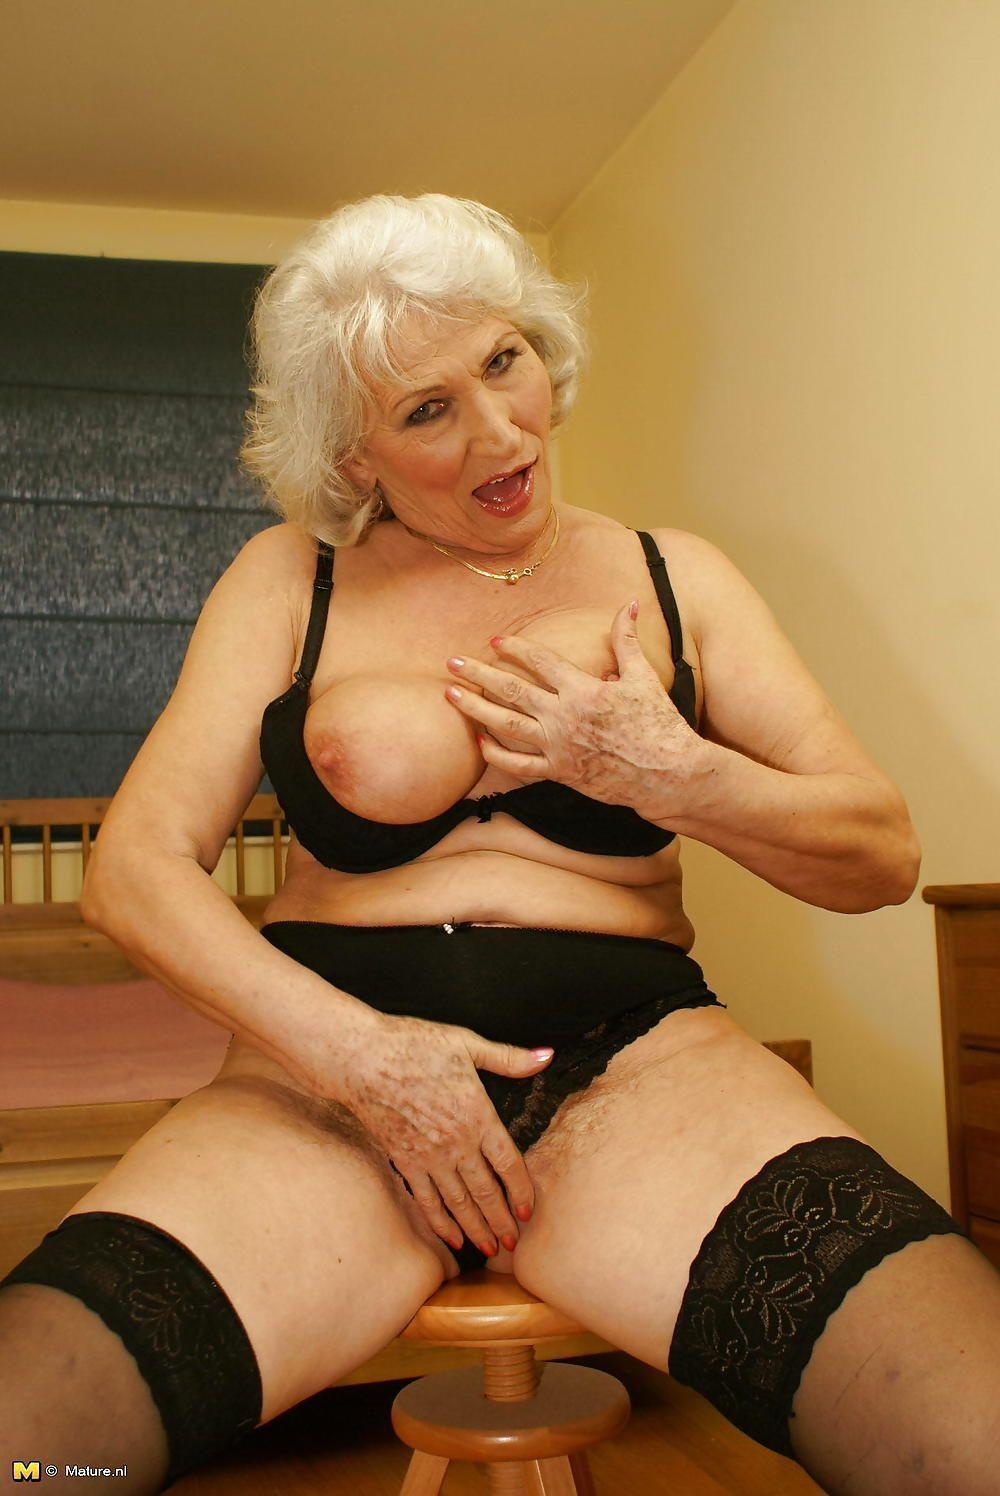 Pics granny norma Browse Richy50's